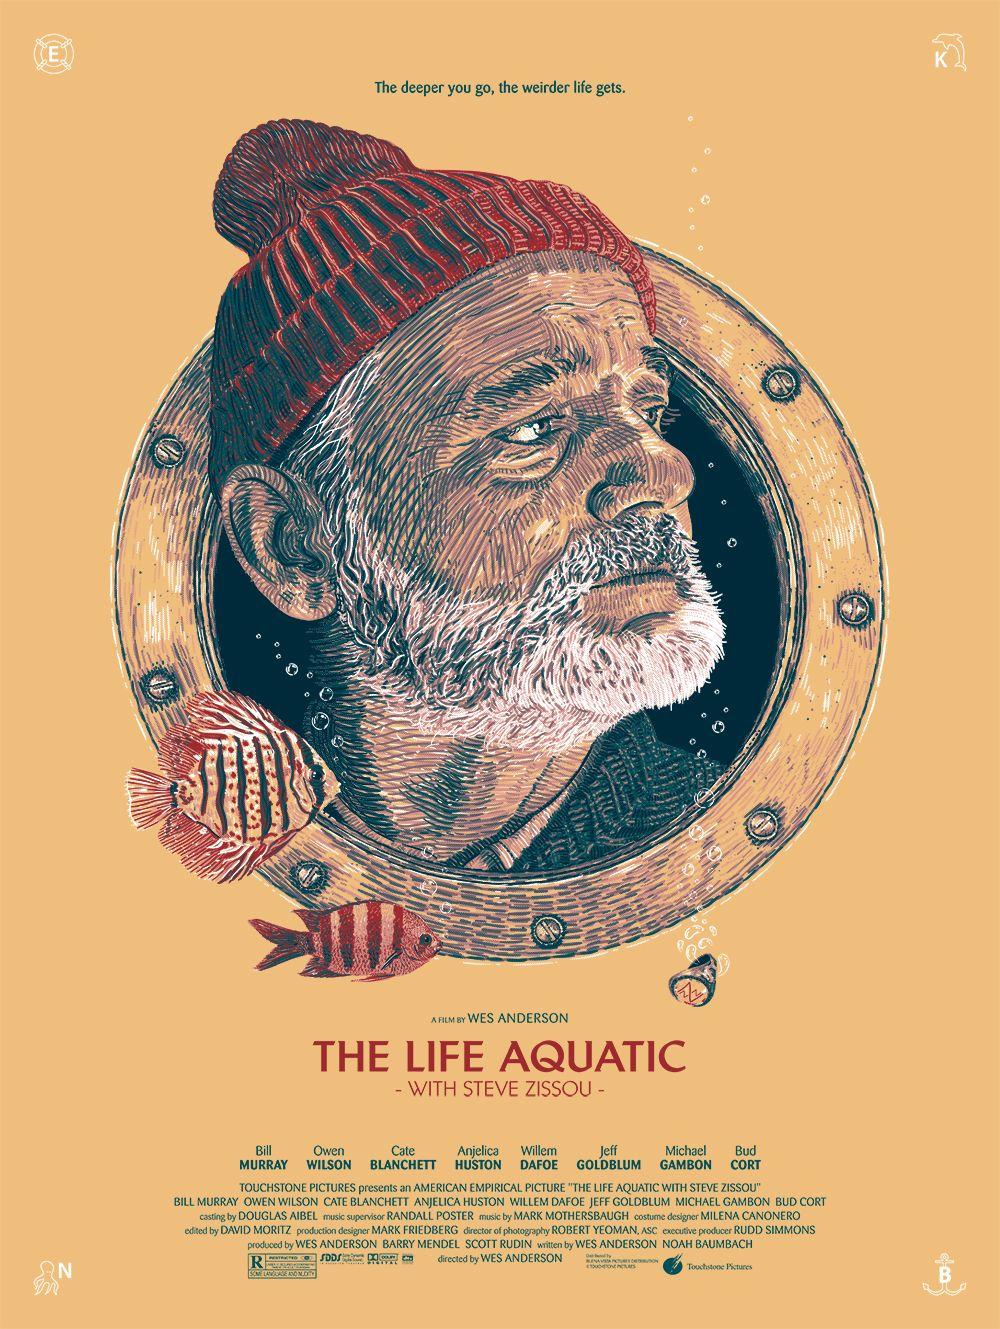 The Life Aquatic with Steve Zissou - movie poster ...